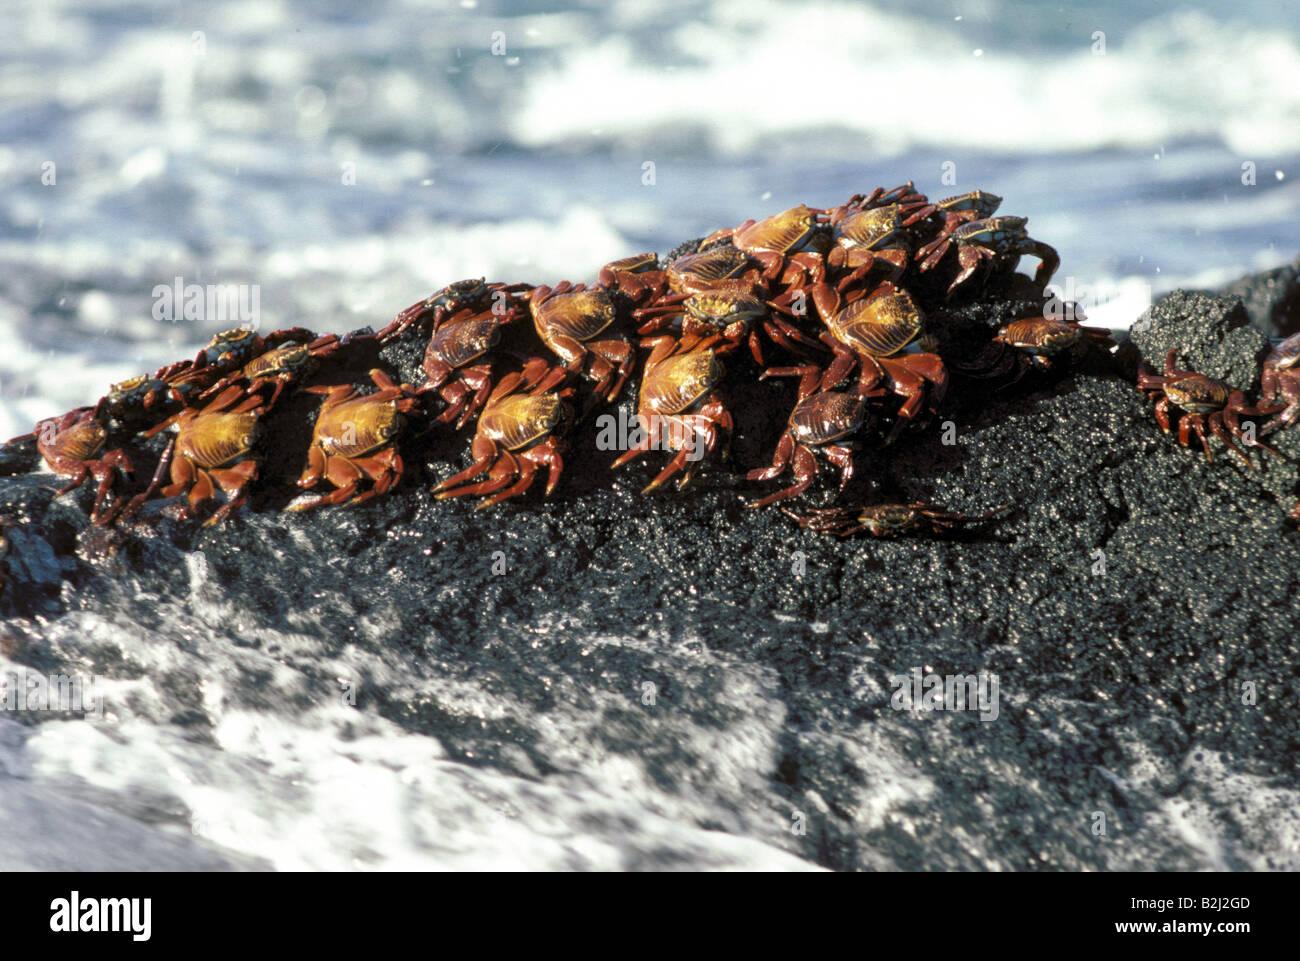 zoology / animals, shellfish / crustacean, rock crabs, Red Rock Crab, (Grapsus grapsus), sitting on rock, Galapagos - Stock Image